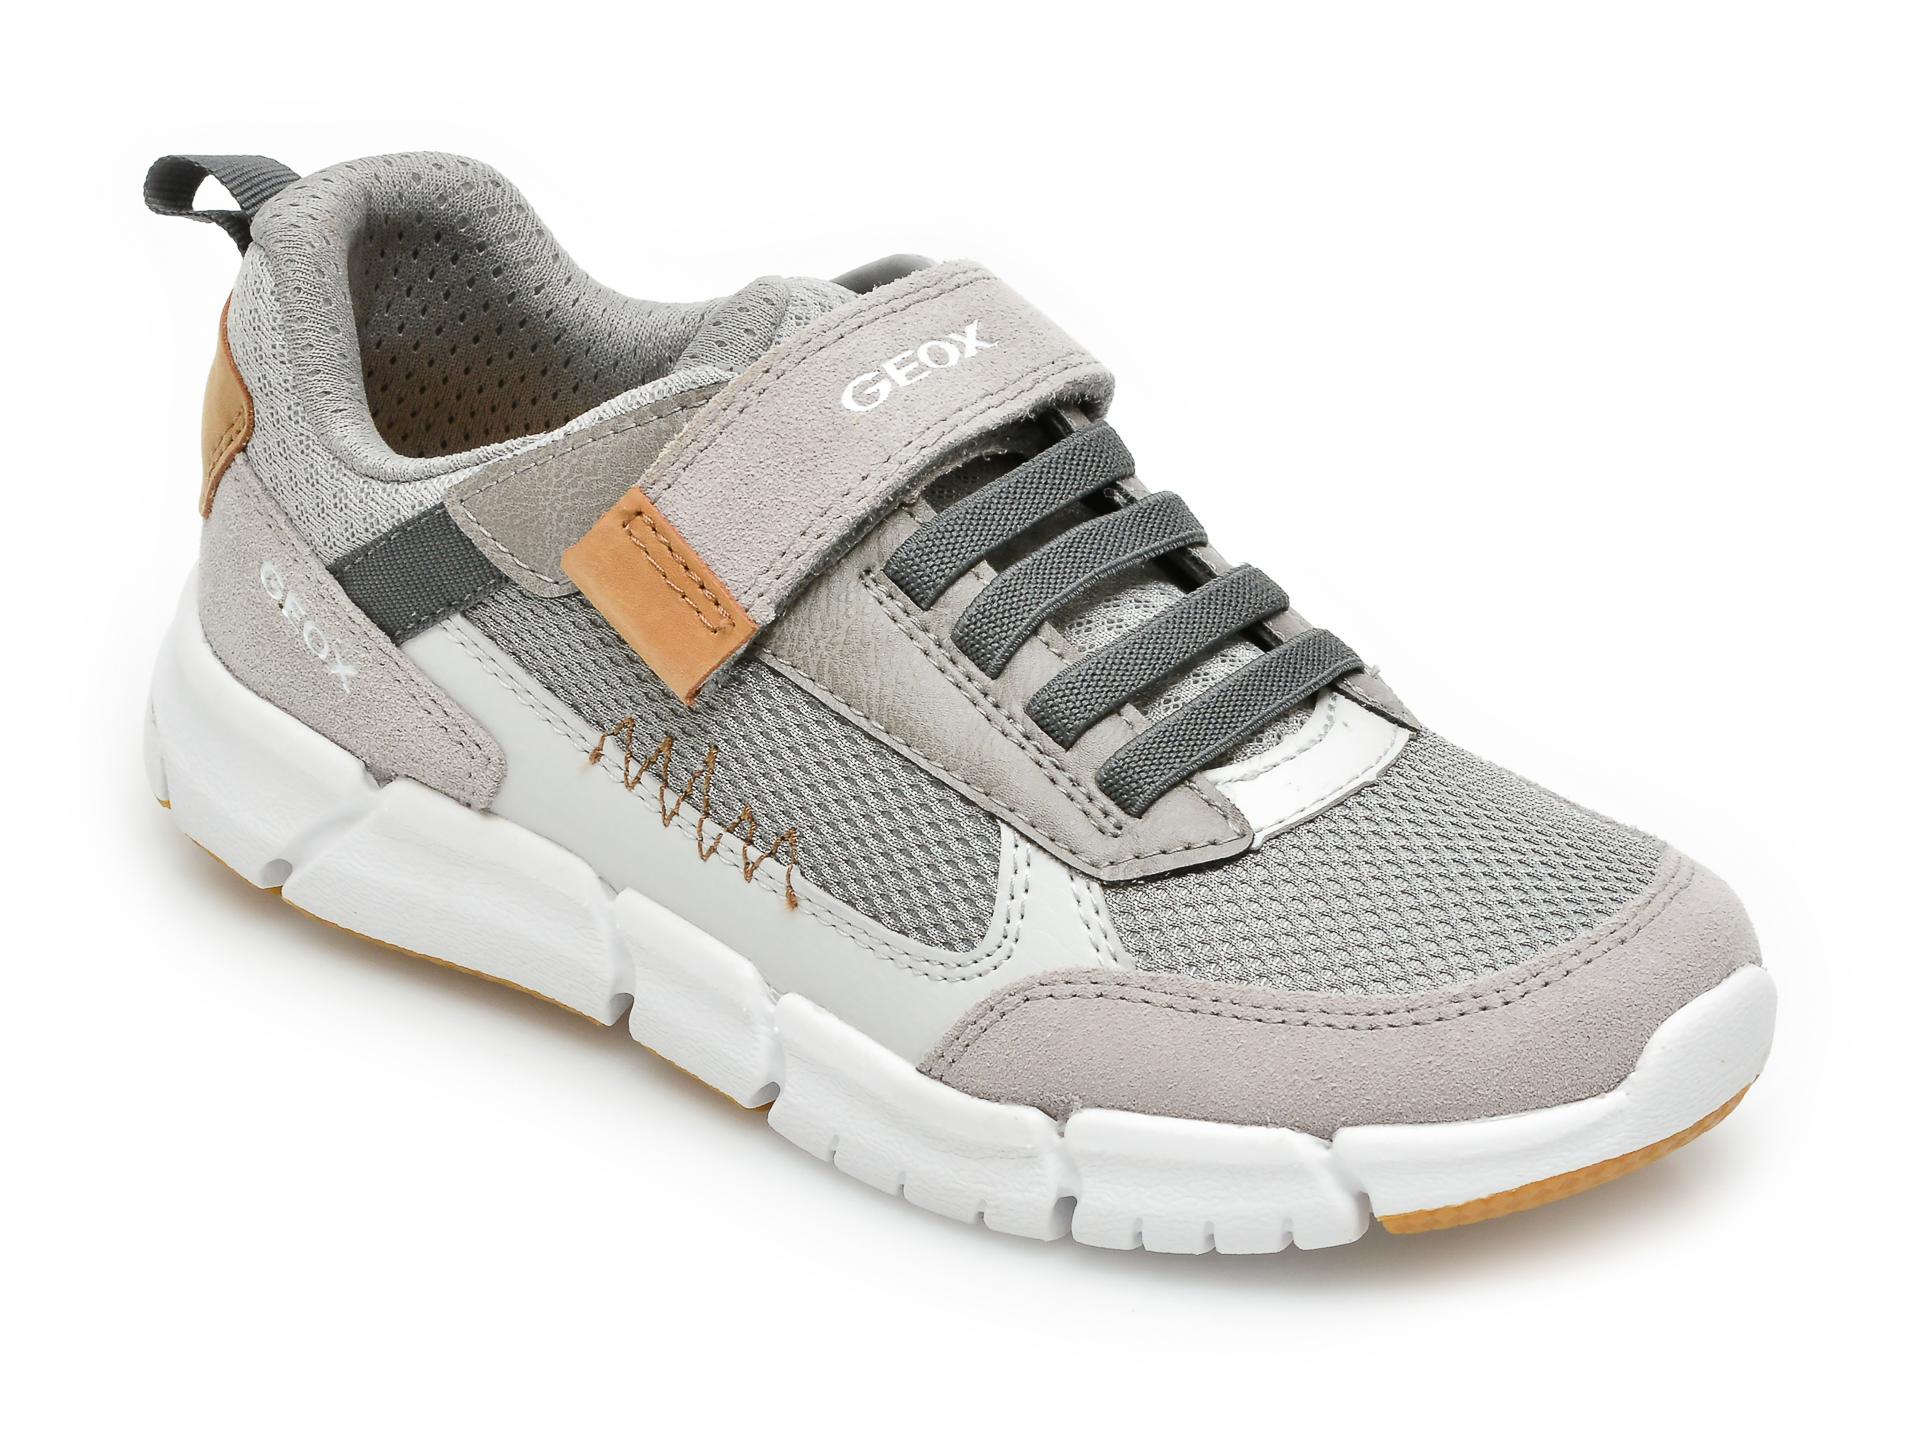 Pantofi sport GEOX gri, J159BB, din material textil si piele naturala